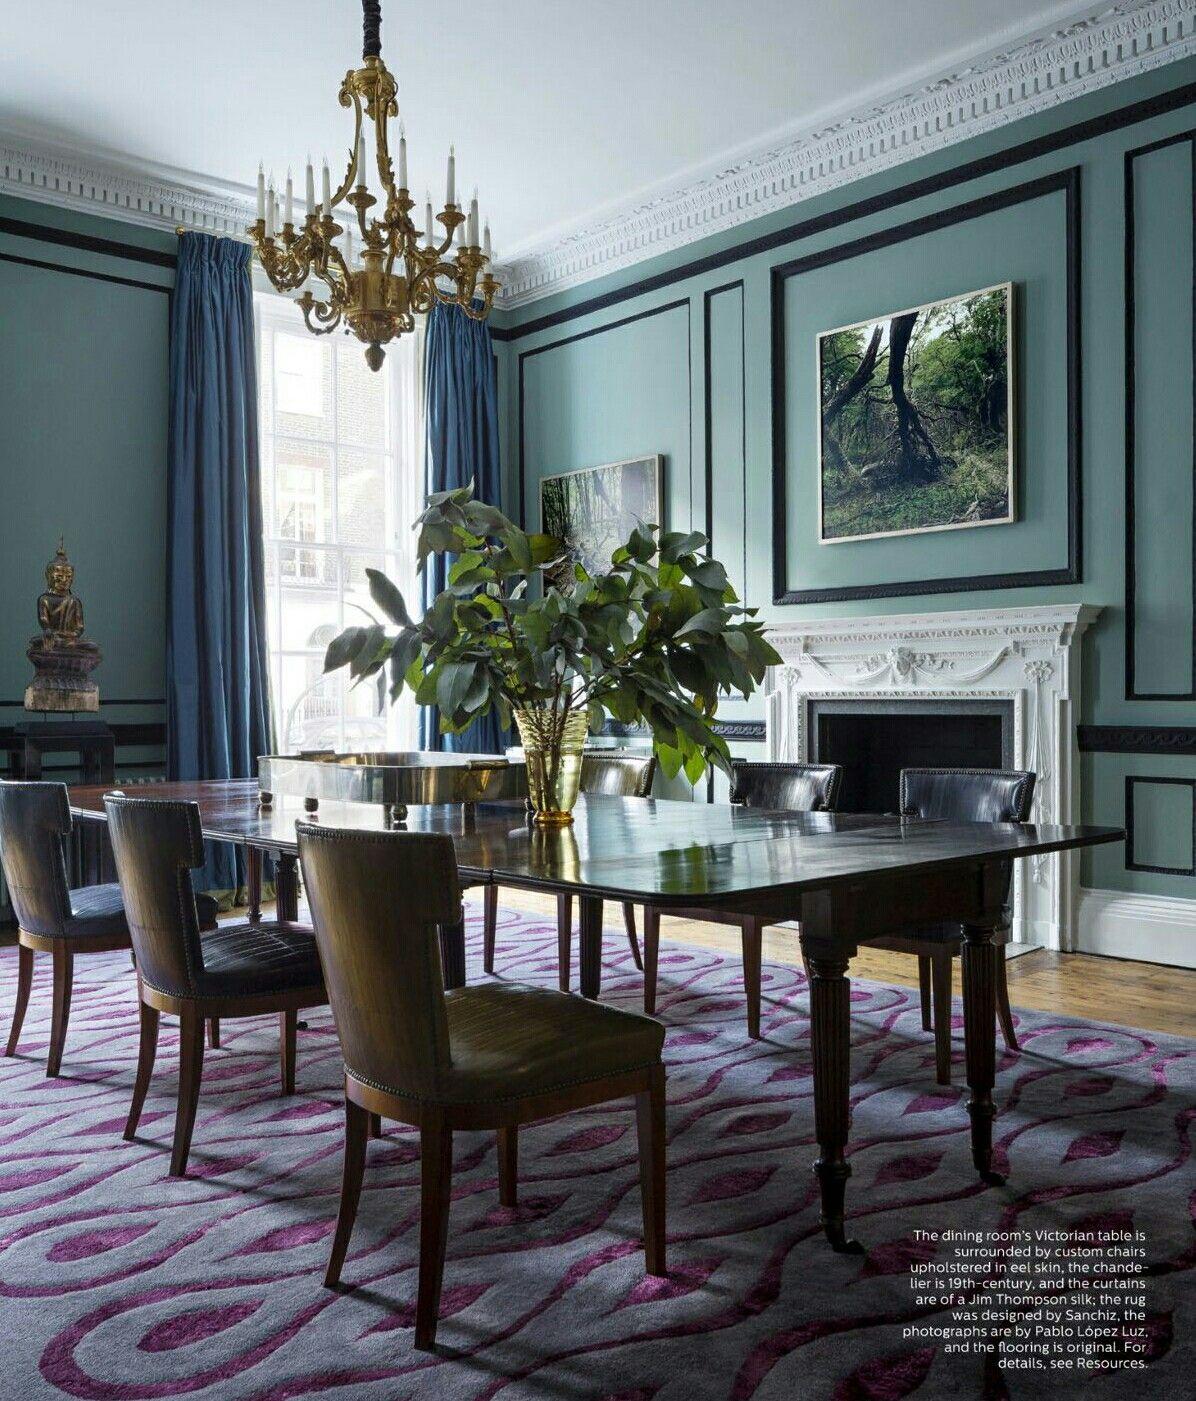 Elle Decor Interior Design By Patricia Sanchiz Blanca Fabre Purple Dining Room Dining Room Victorian Dining Room Design